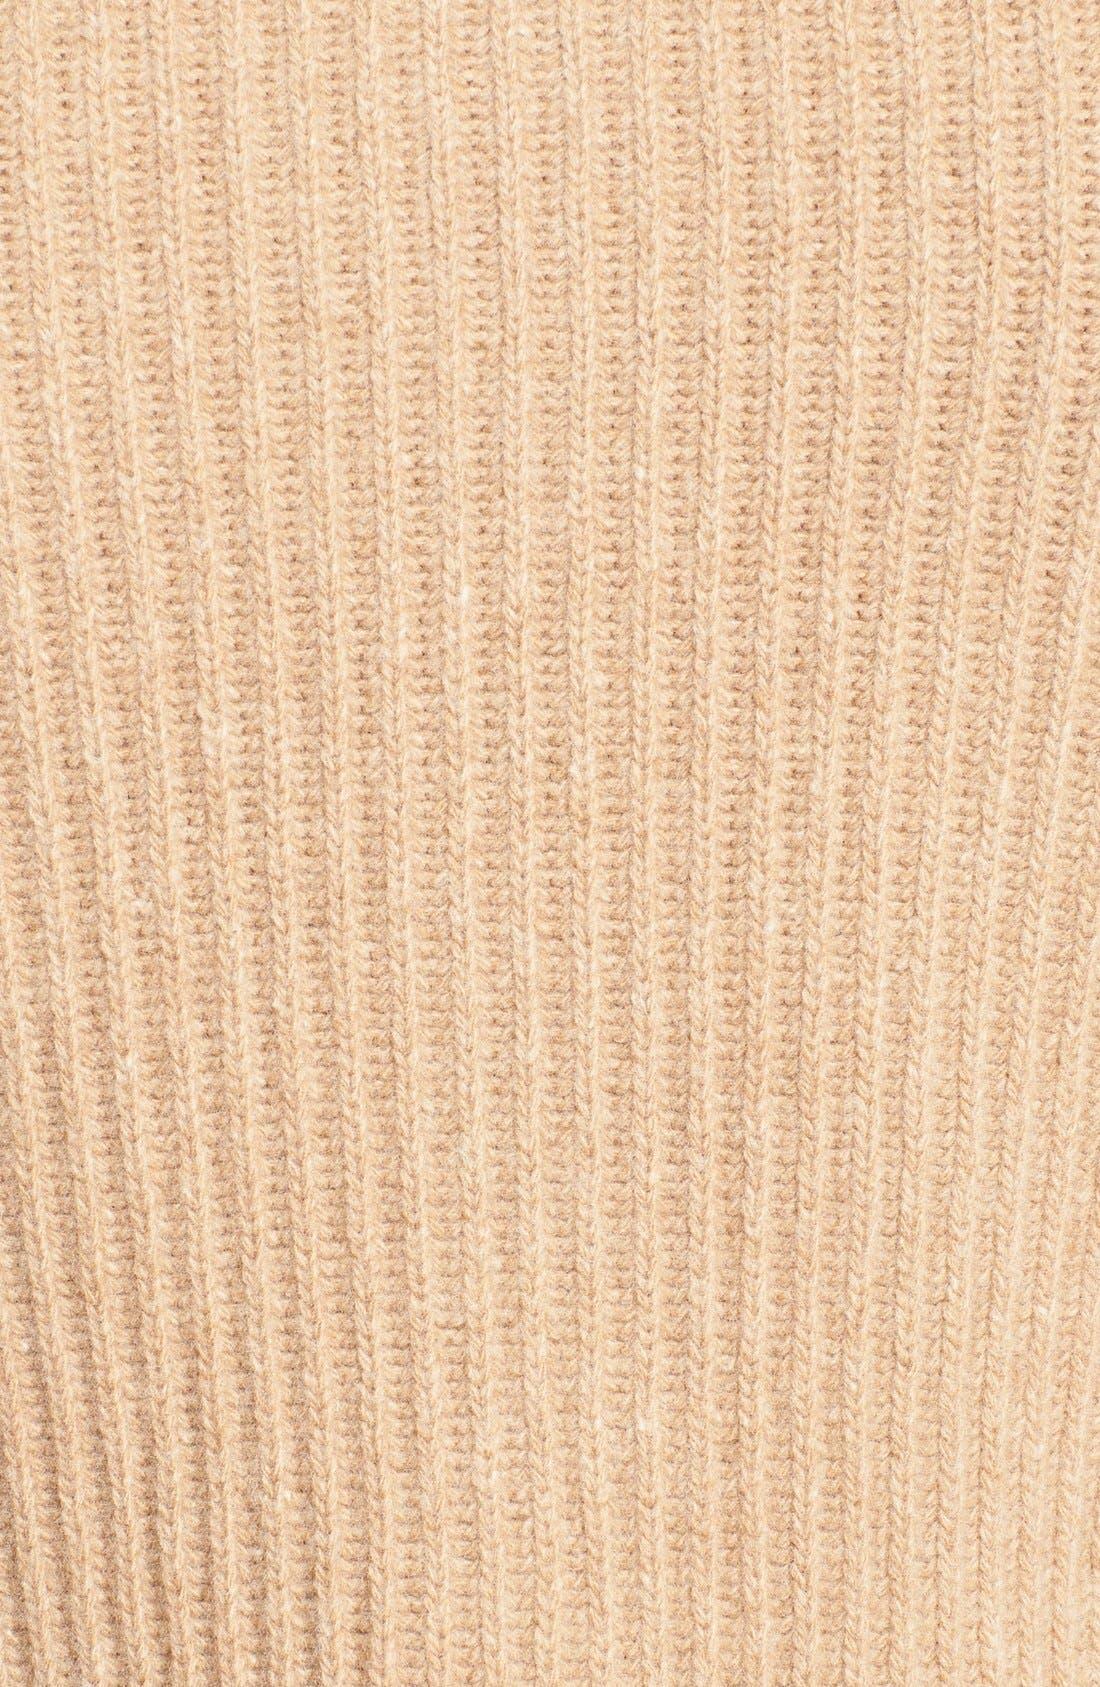 Napoli Wool Cardigan,                             Alternate thumbnail 3, color,                             250